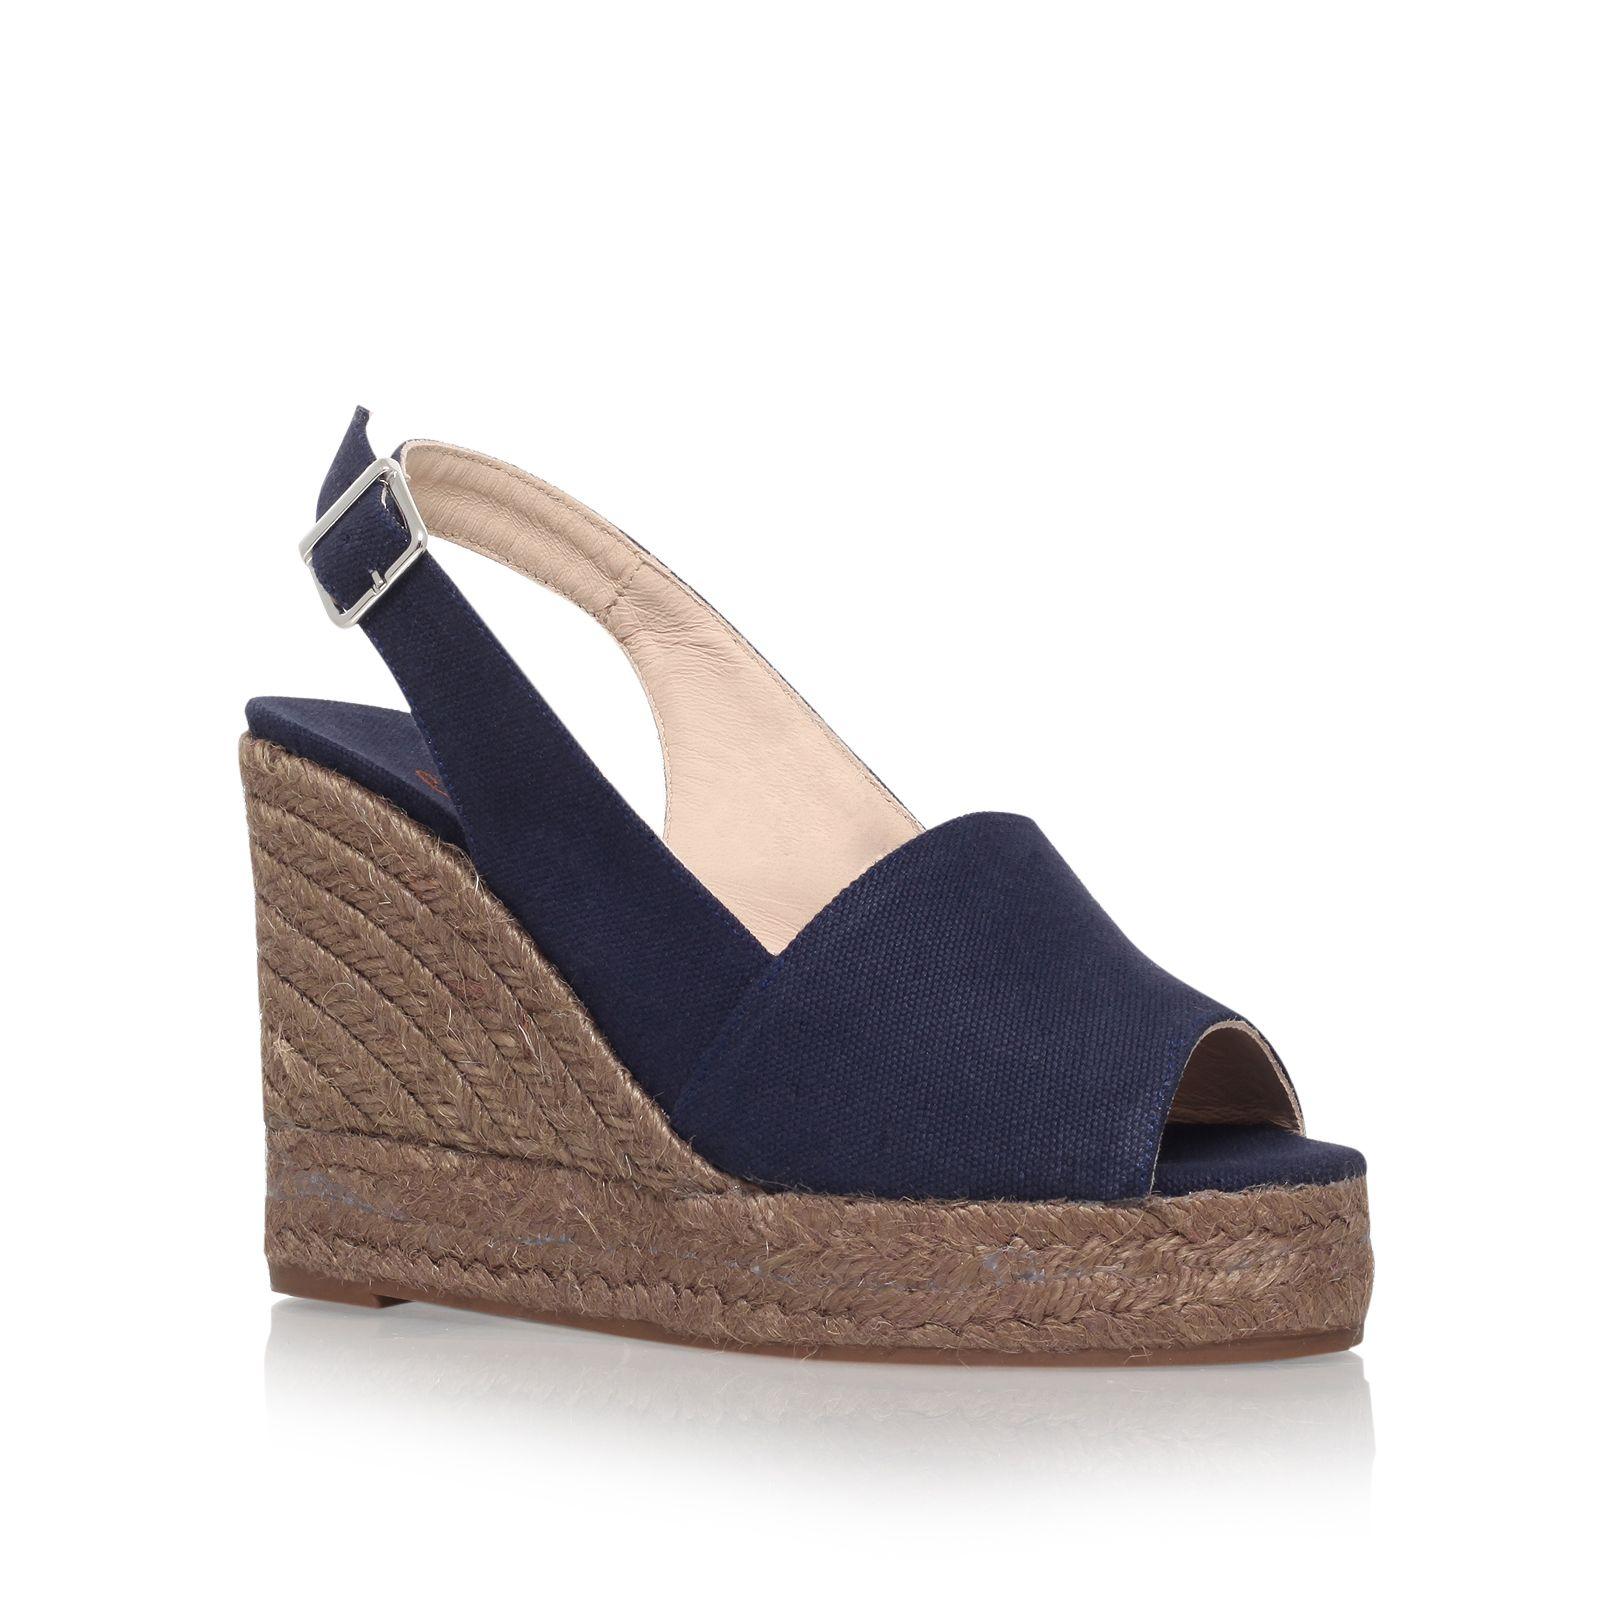 castaner 8 high wedge heel peep toe shoes in blue lyst